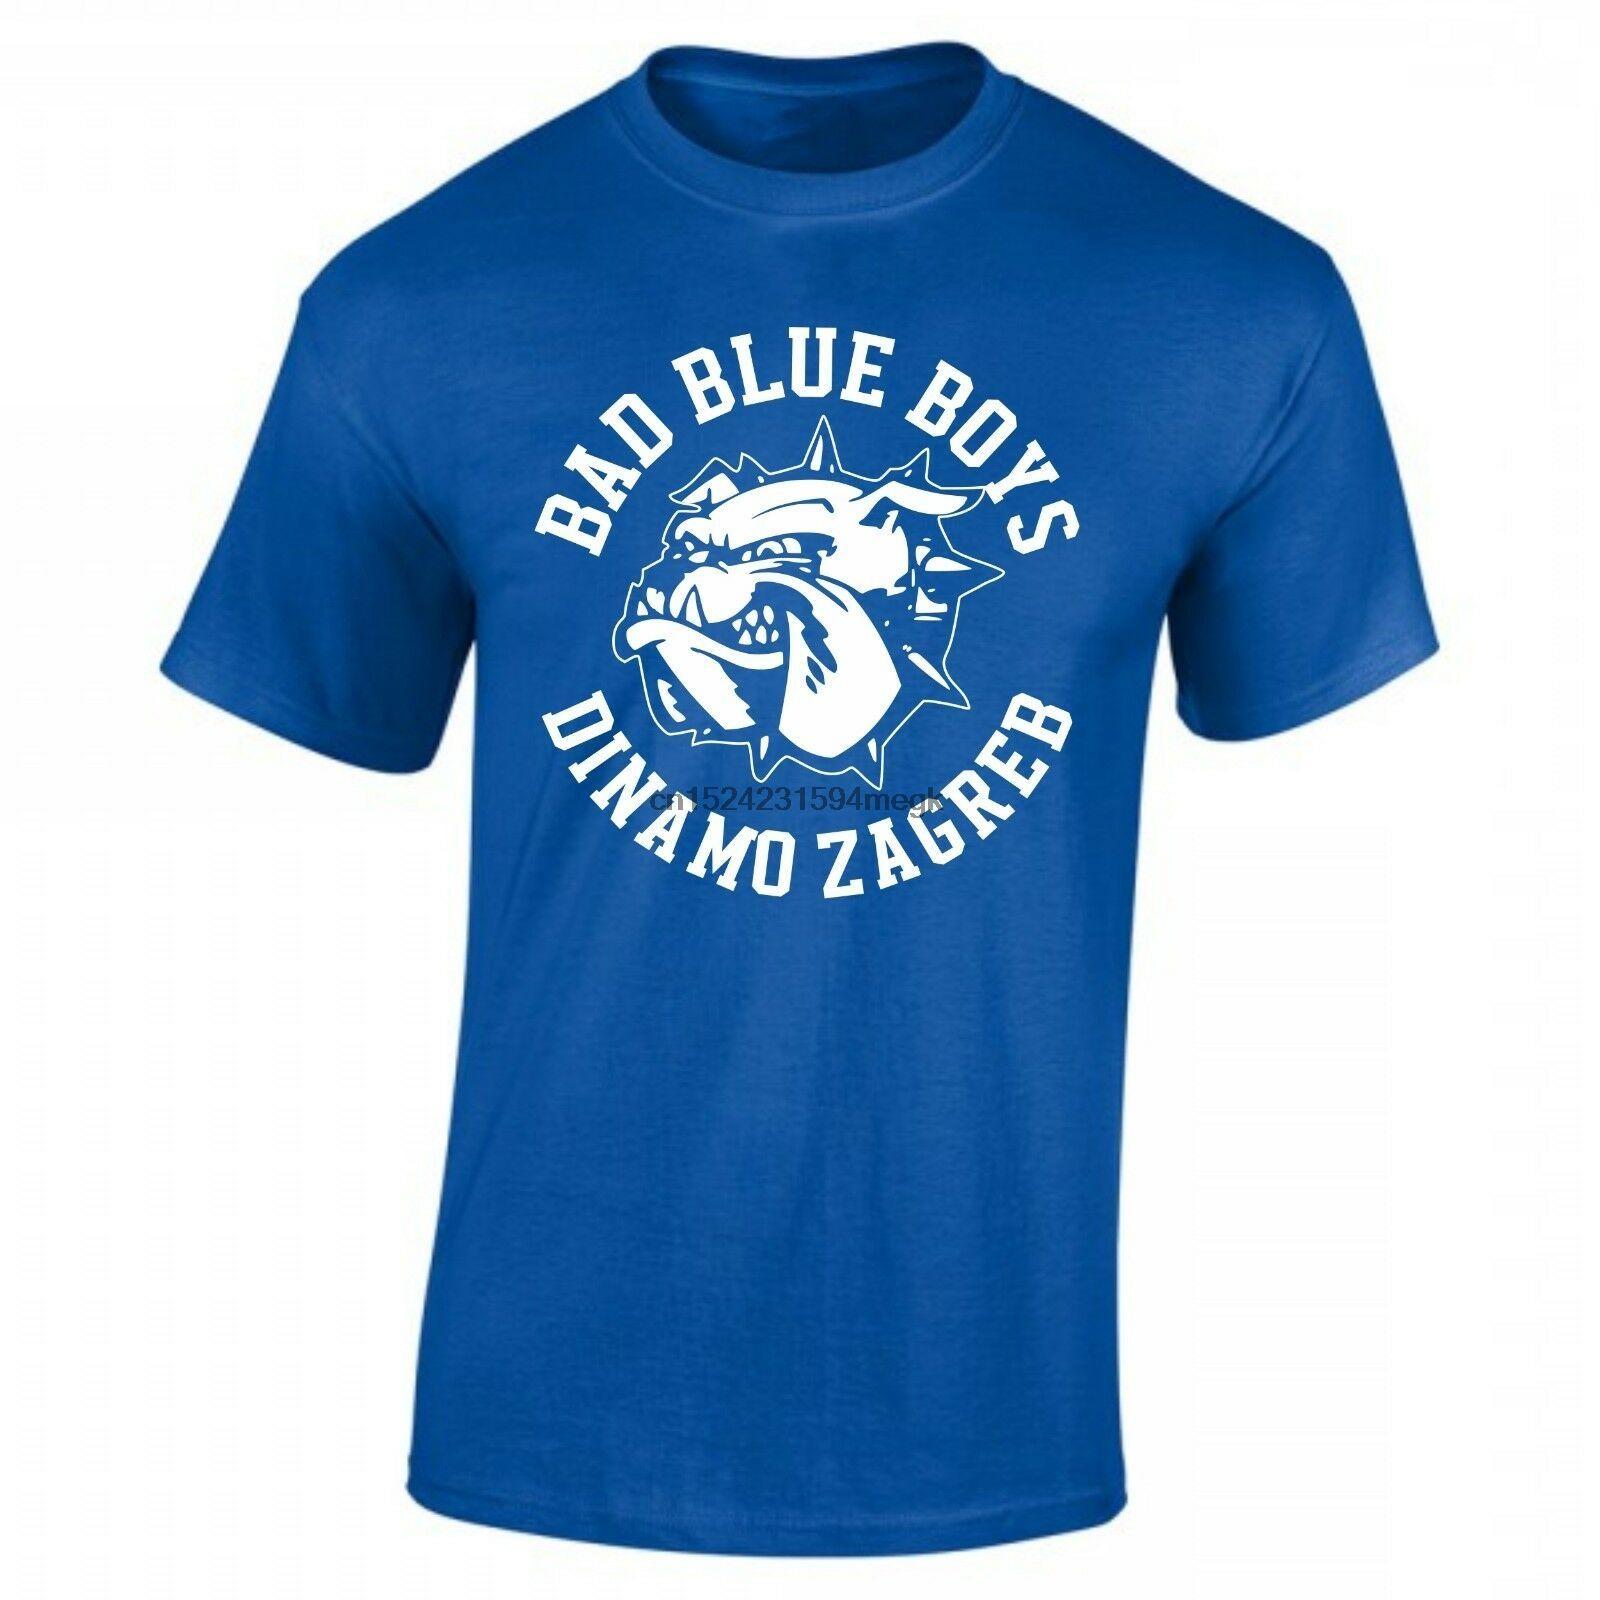 Dinamo Zagreb Bad Blue Ultras Croatia O Neck Tee O Neck T Shirts Customized In 2020 Boys T Shirts Shirts T Shirt